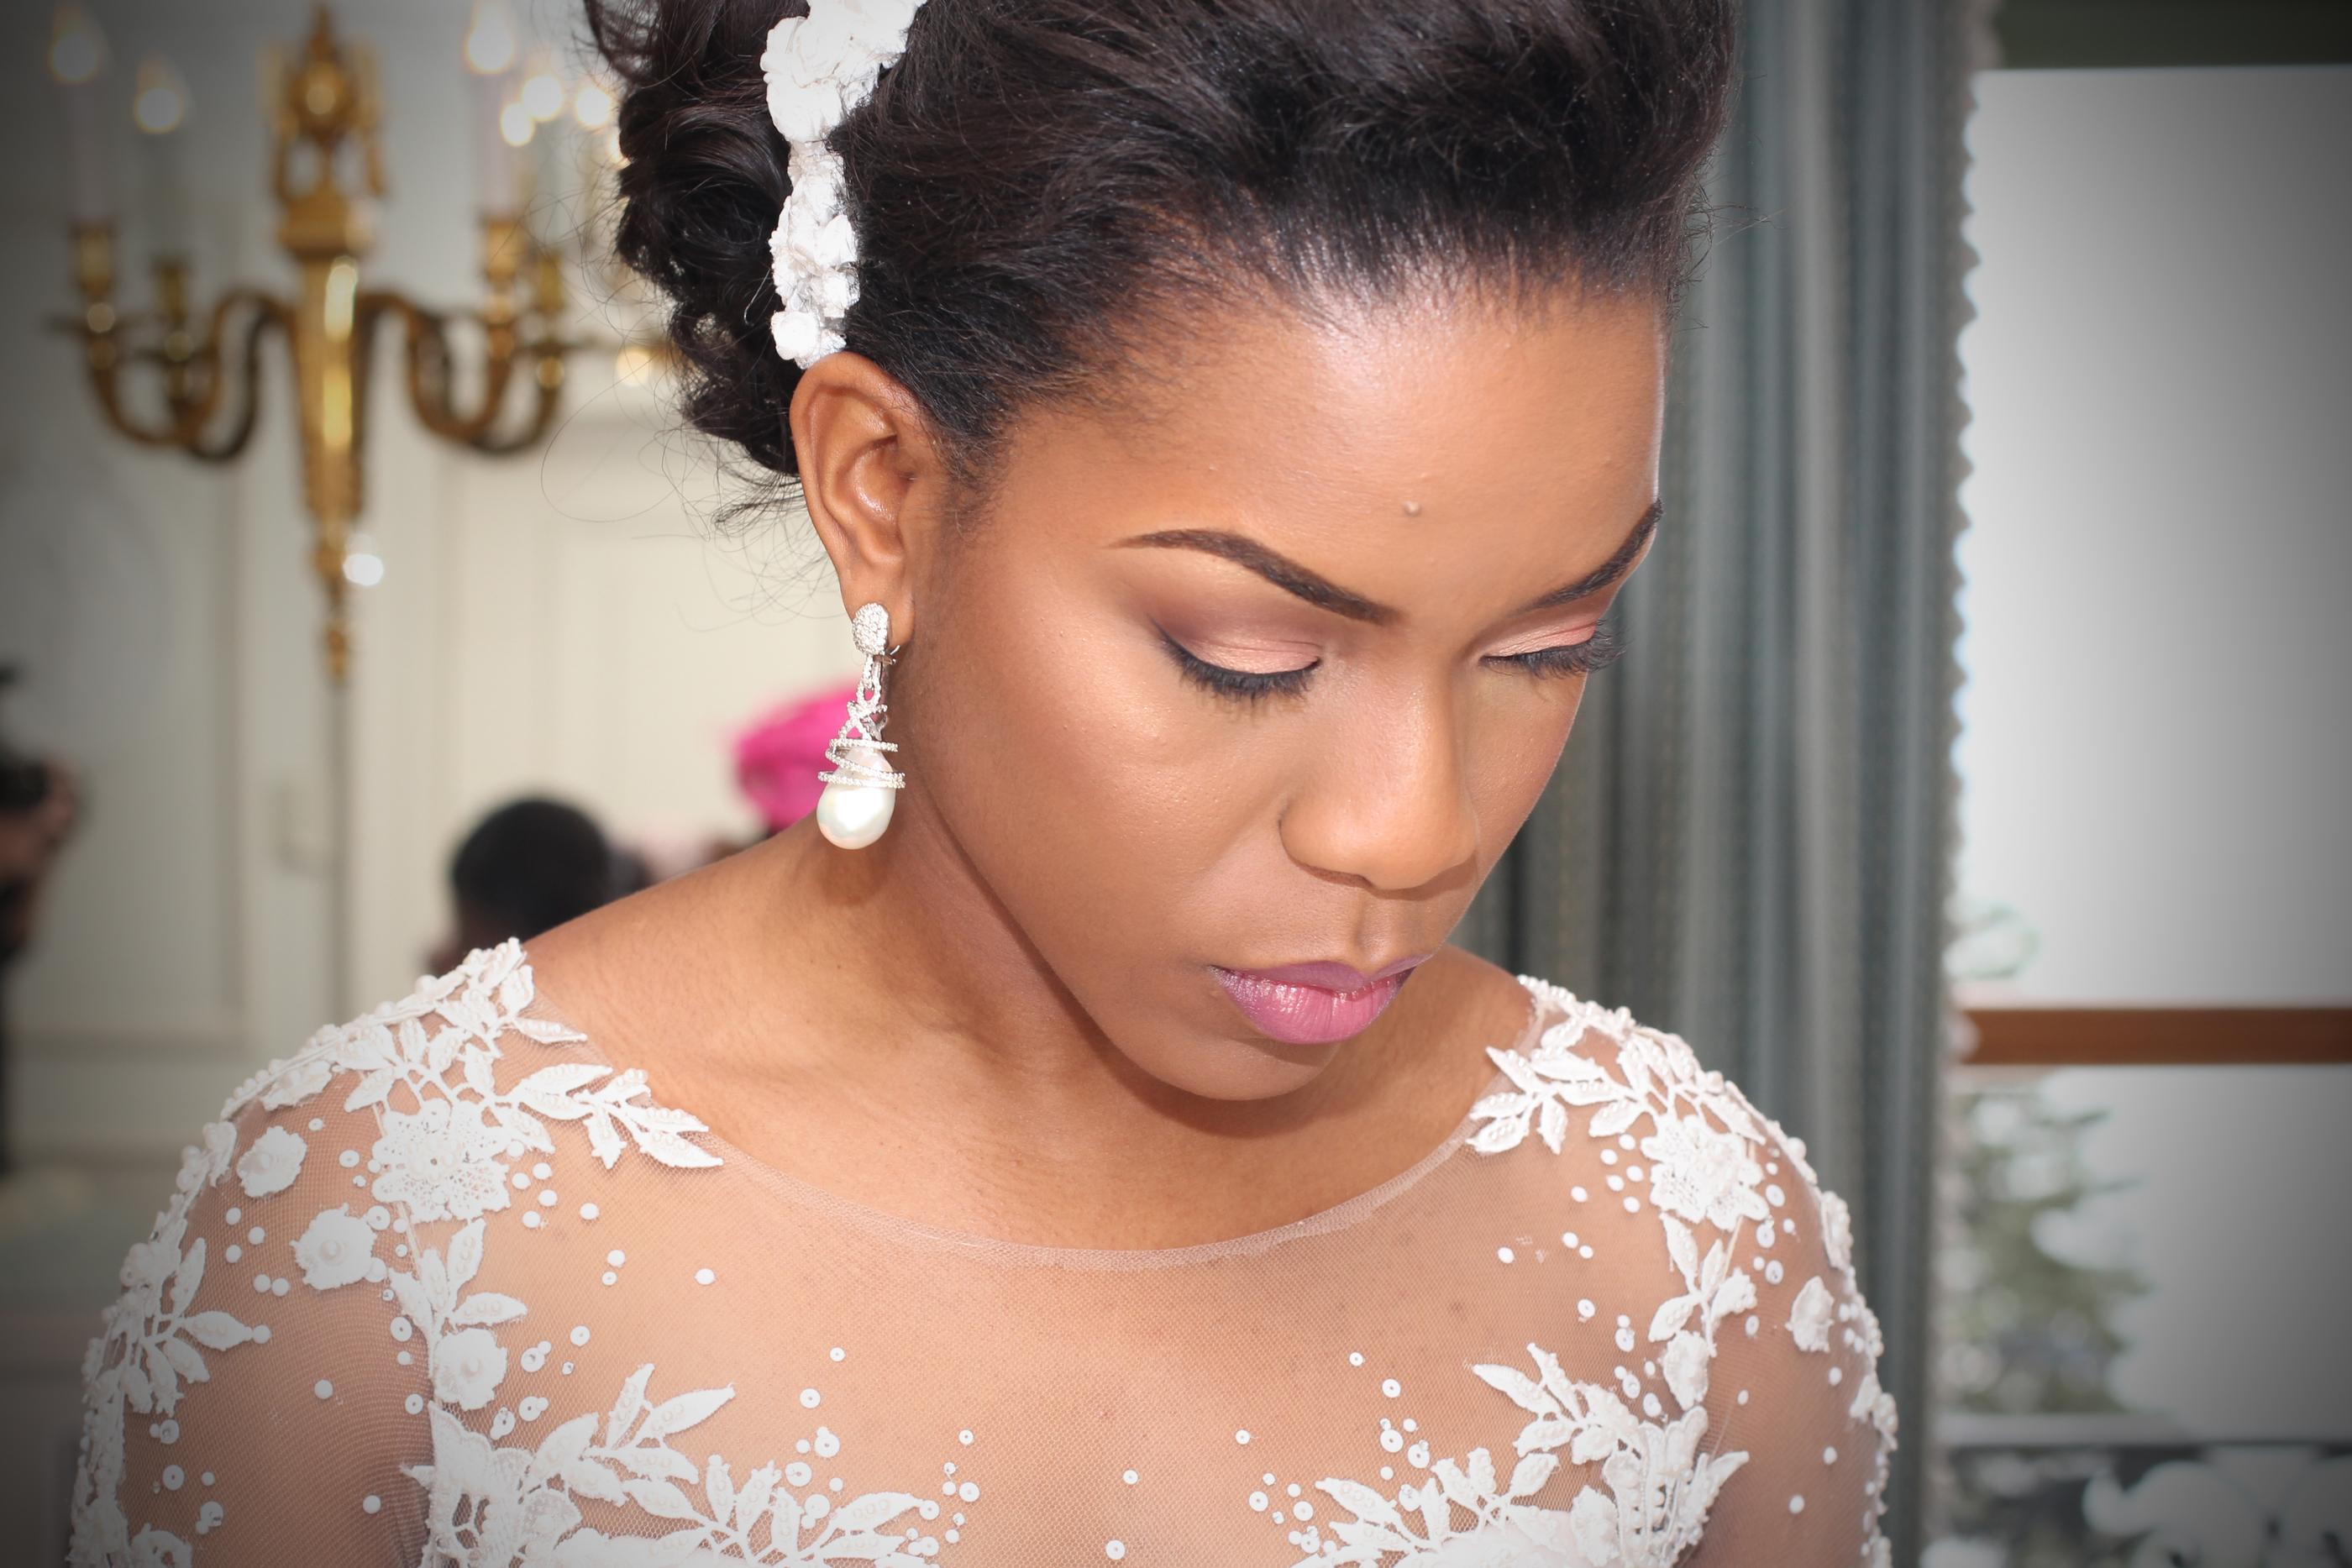 Destination Wedding Makeup Artist : Joy Adenuga Makeup Artist joy-adenuga-black-makeup ...